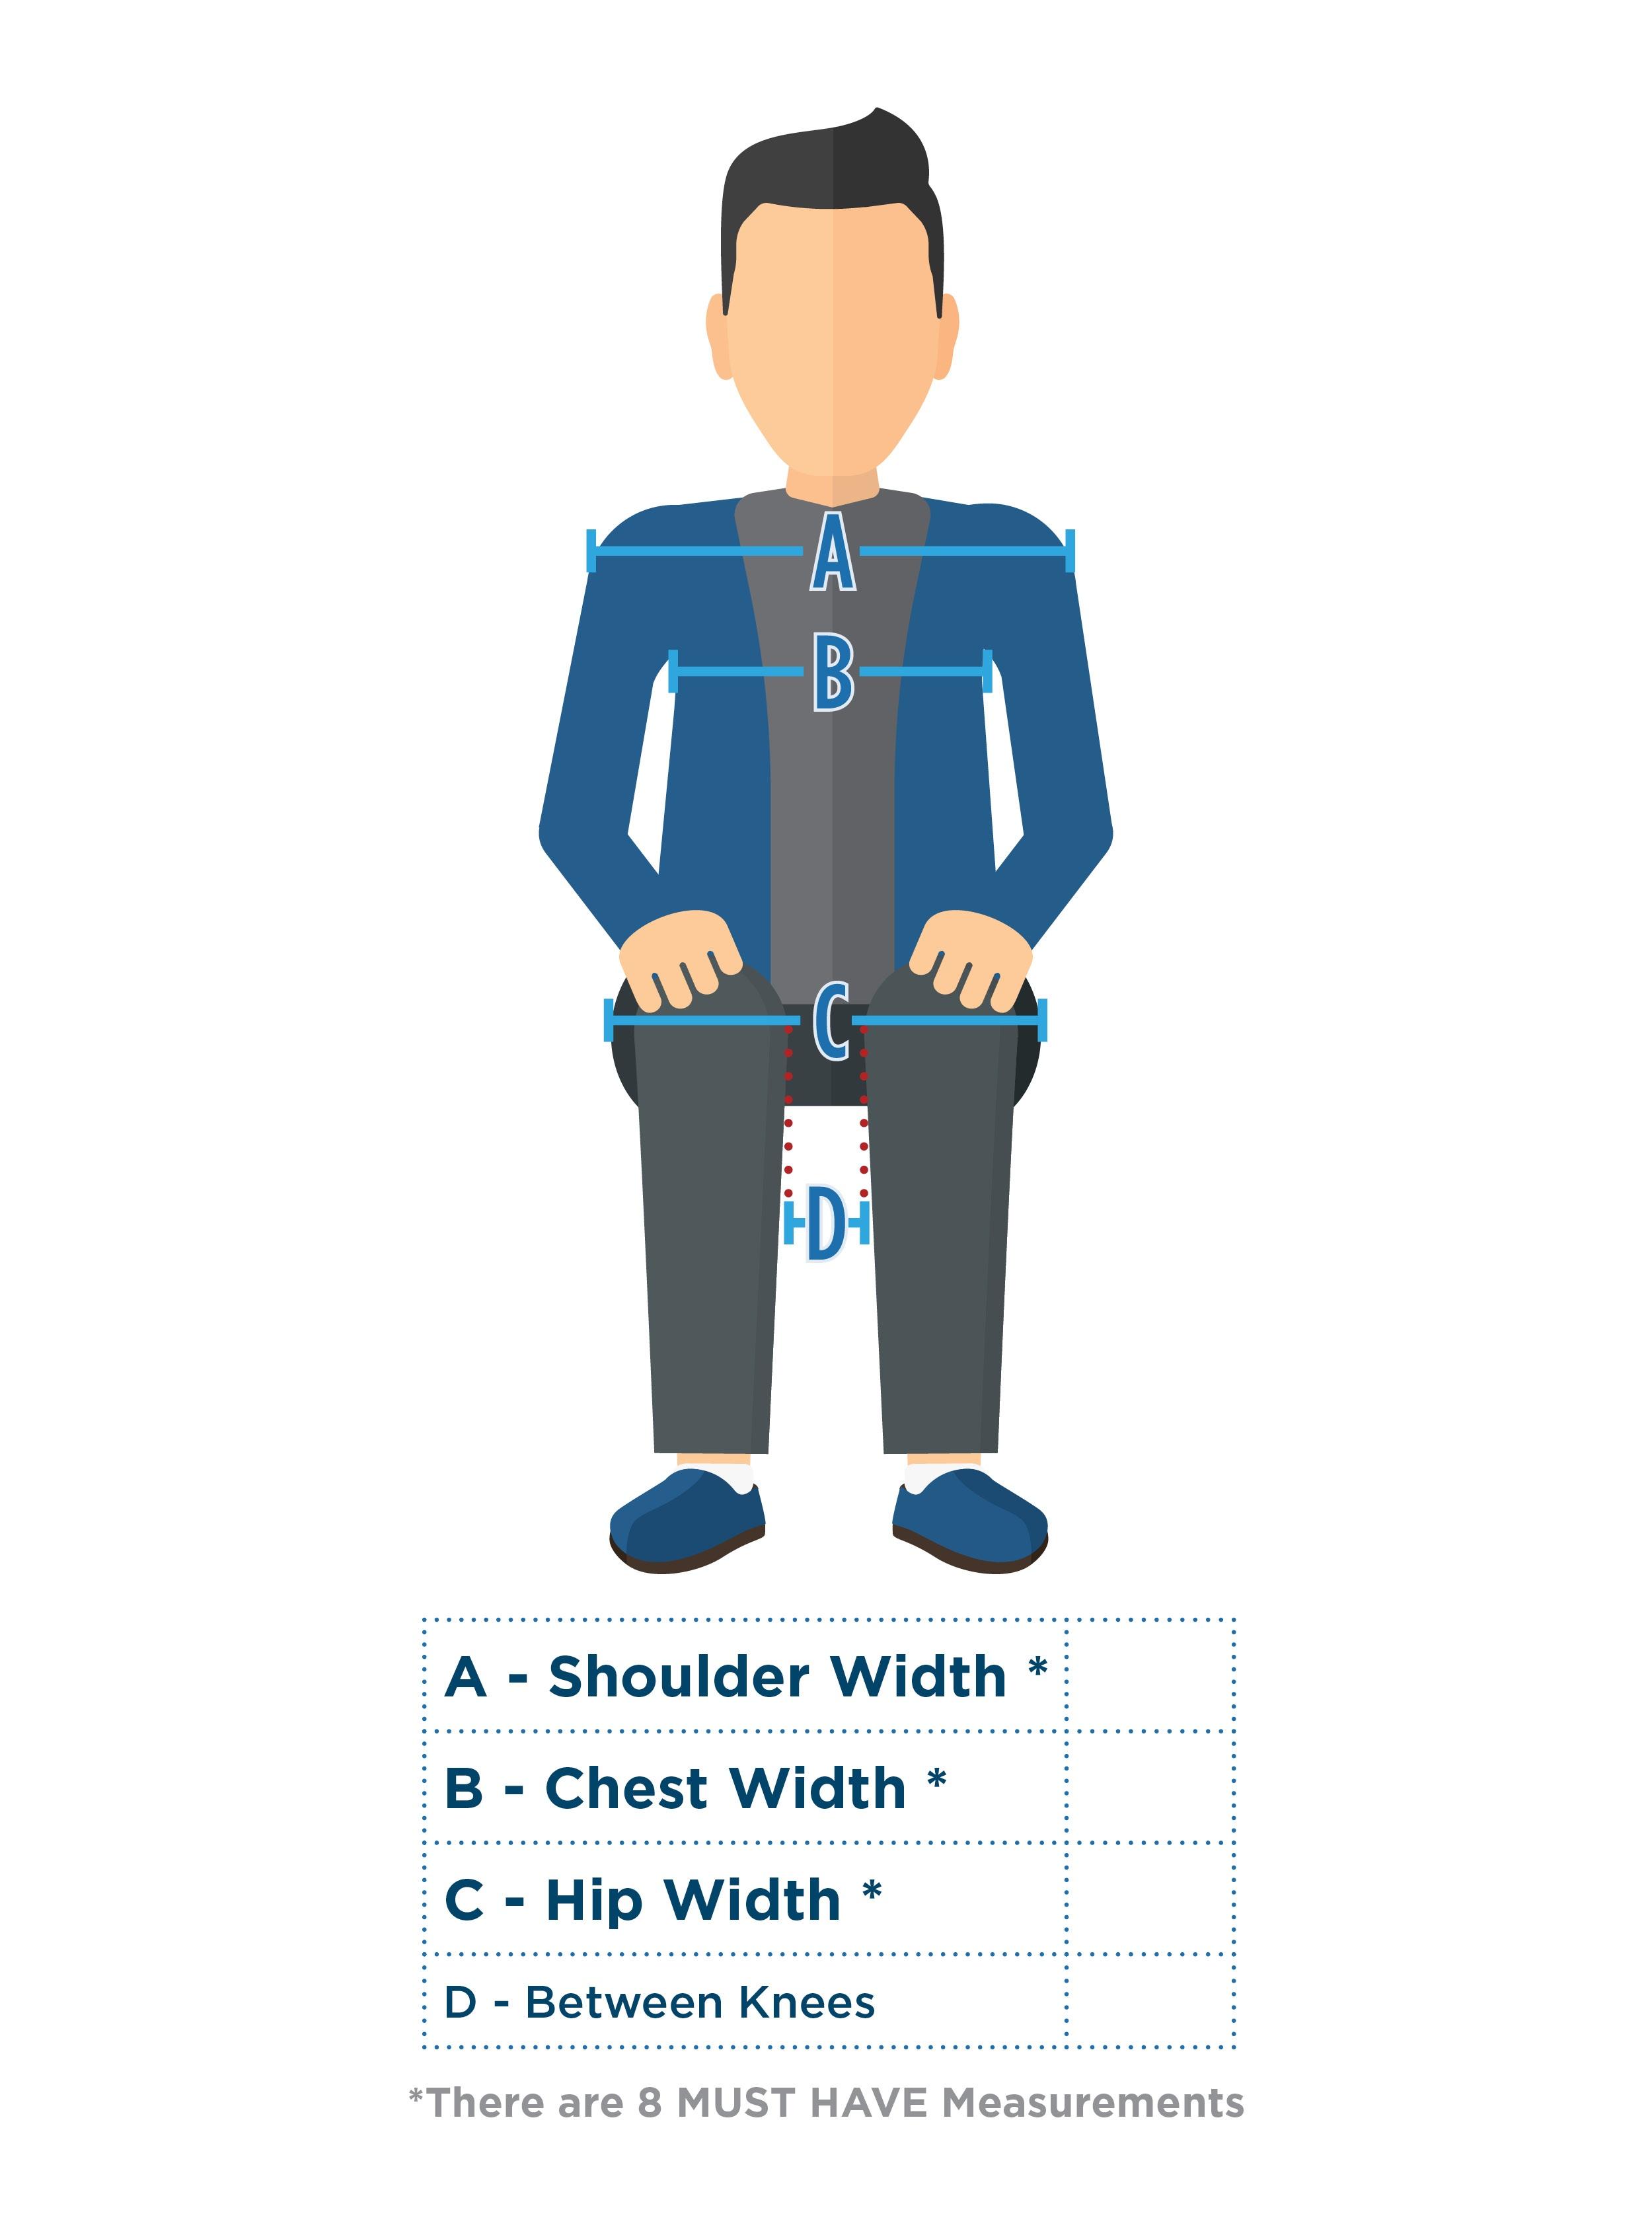 Wheelchair_Measuring_Guide - A-D